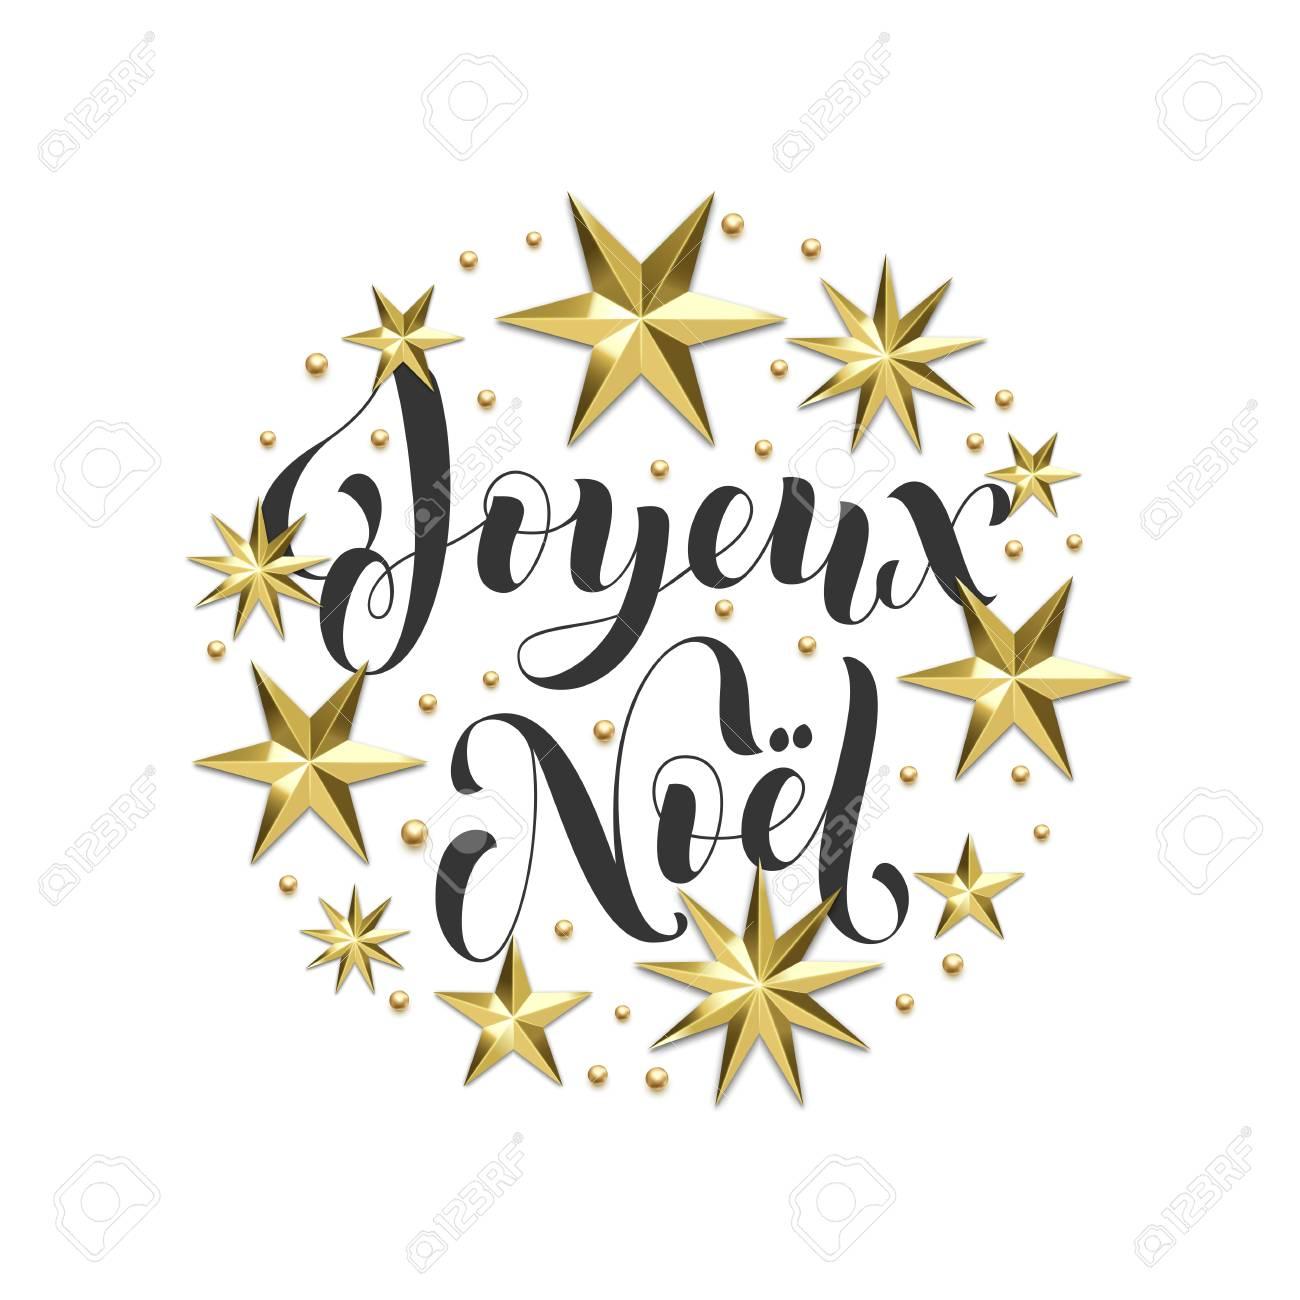 Joyeux Noel Clipart.Joyeux Noel French Merry Christmas Golden Decoration Calligraphy